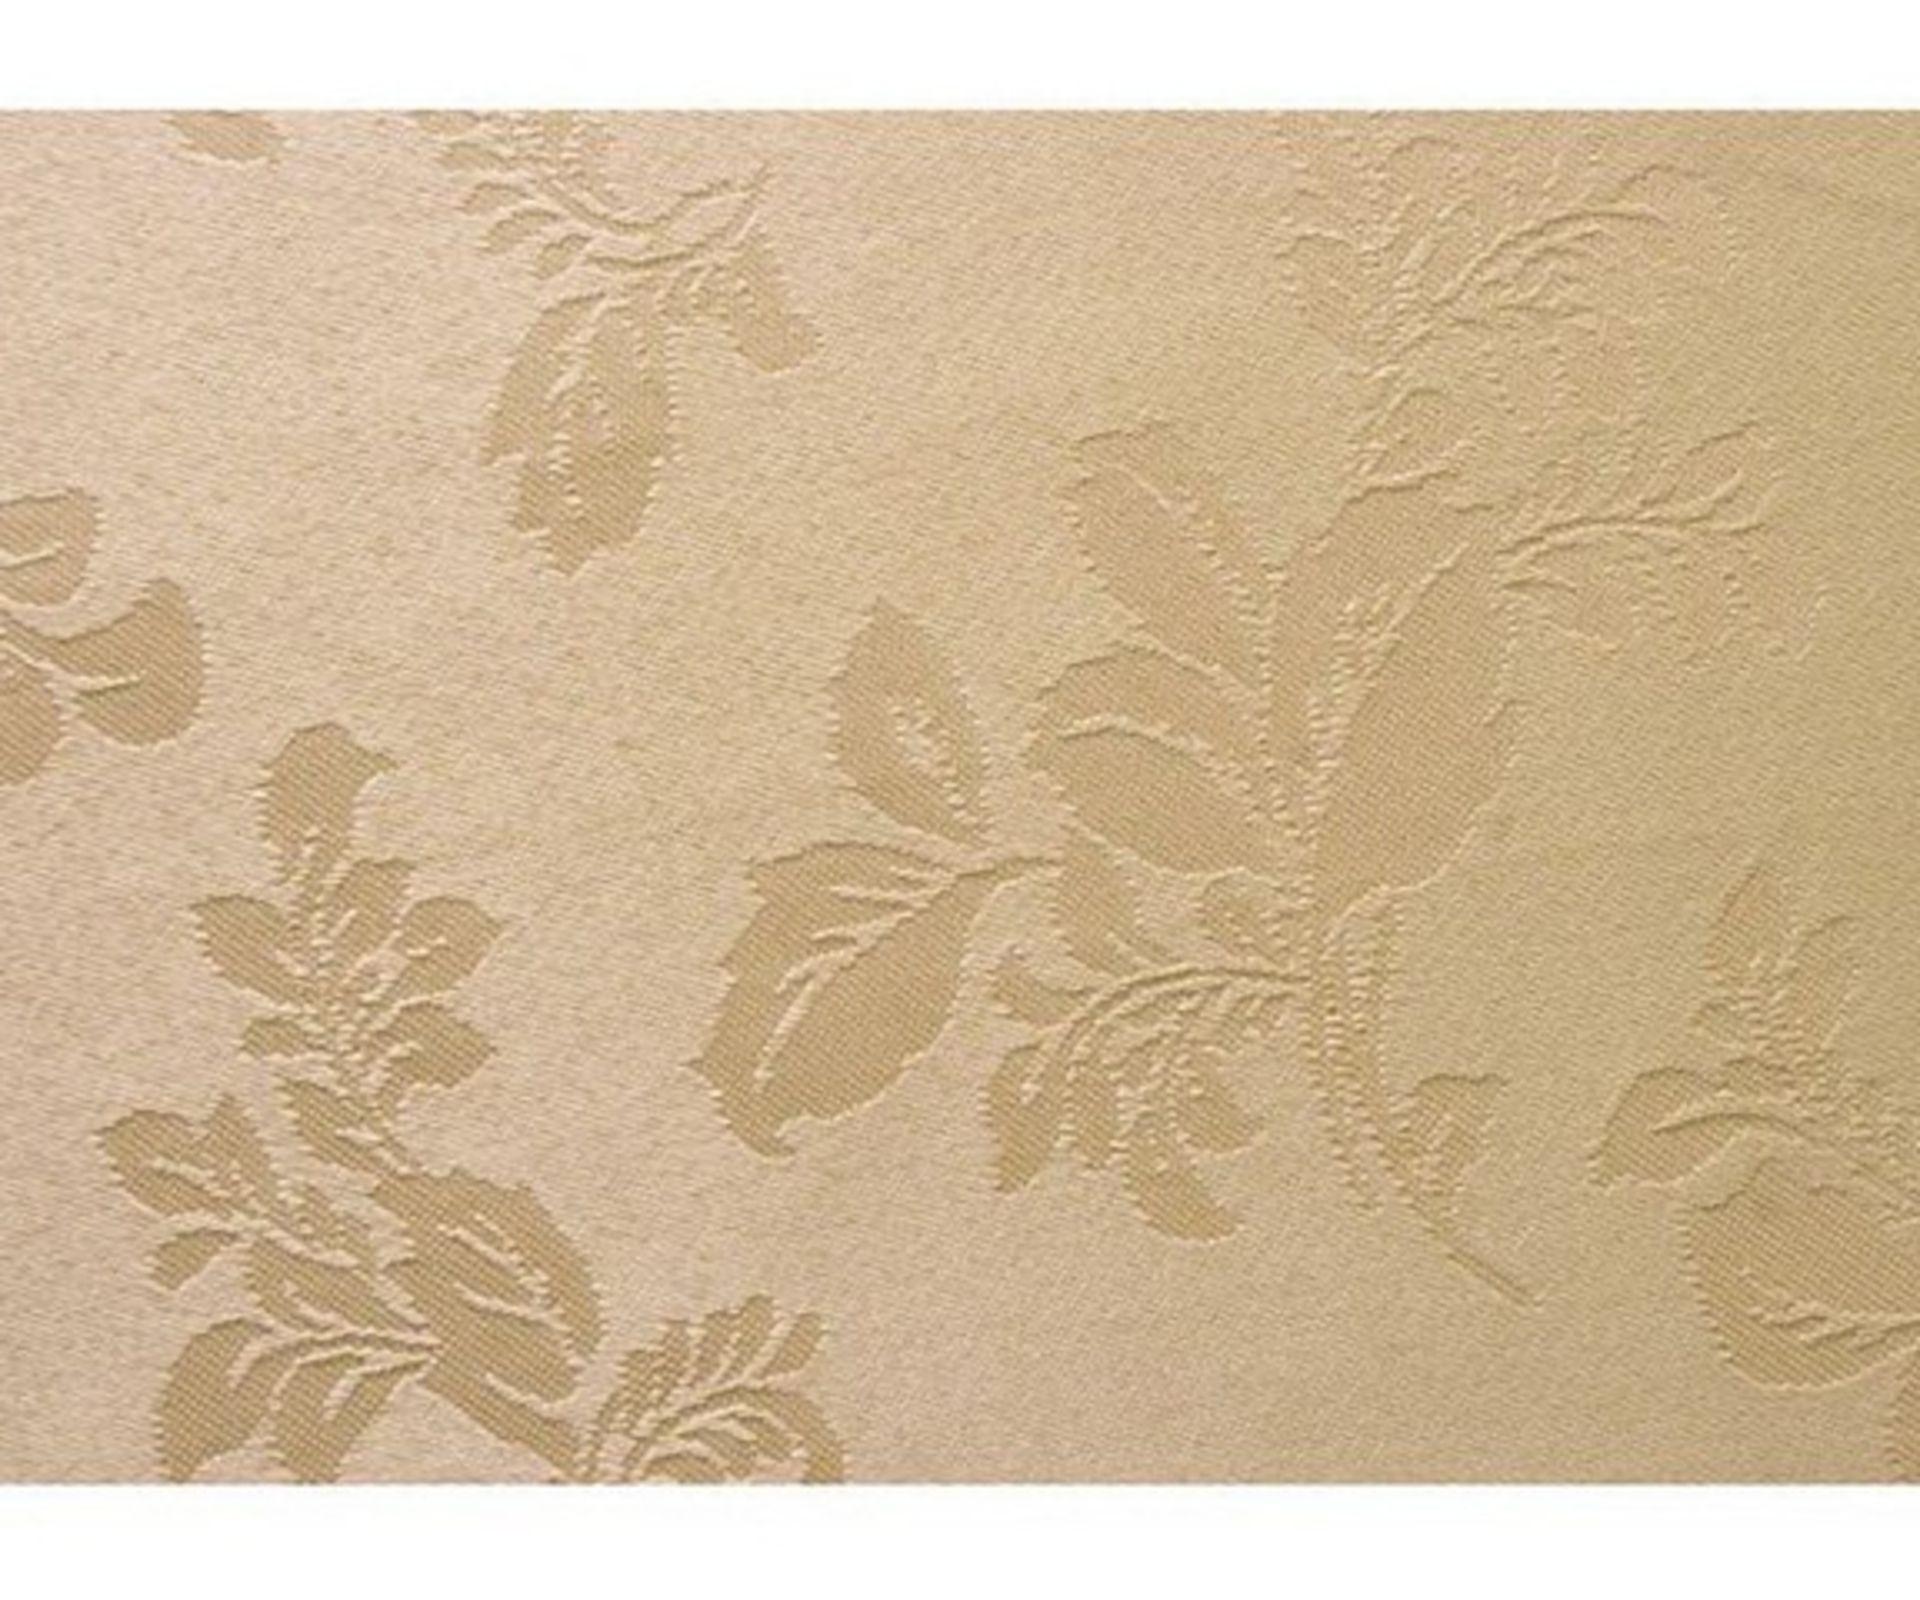 Lot 50115 - V Brand New Luxury Stain Resistant Linen Table Cloth 160 x 210cm Gold - ISP £34.99 (islshop-UK)